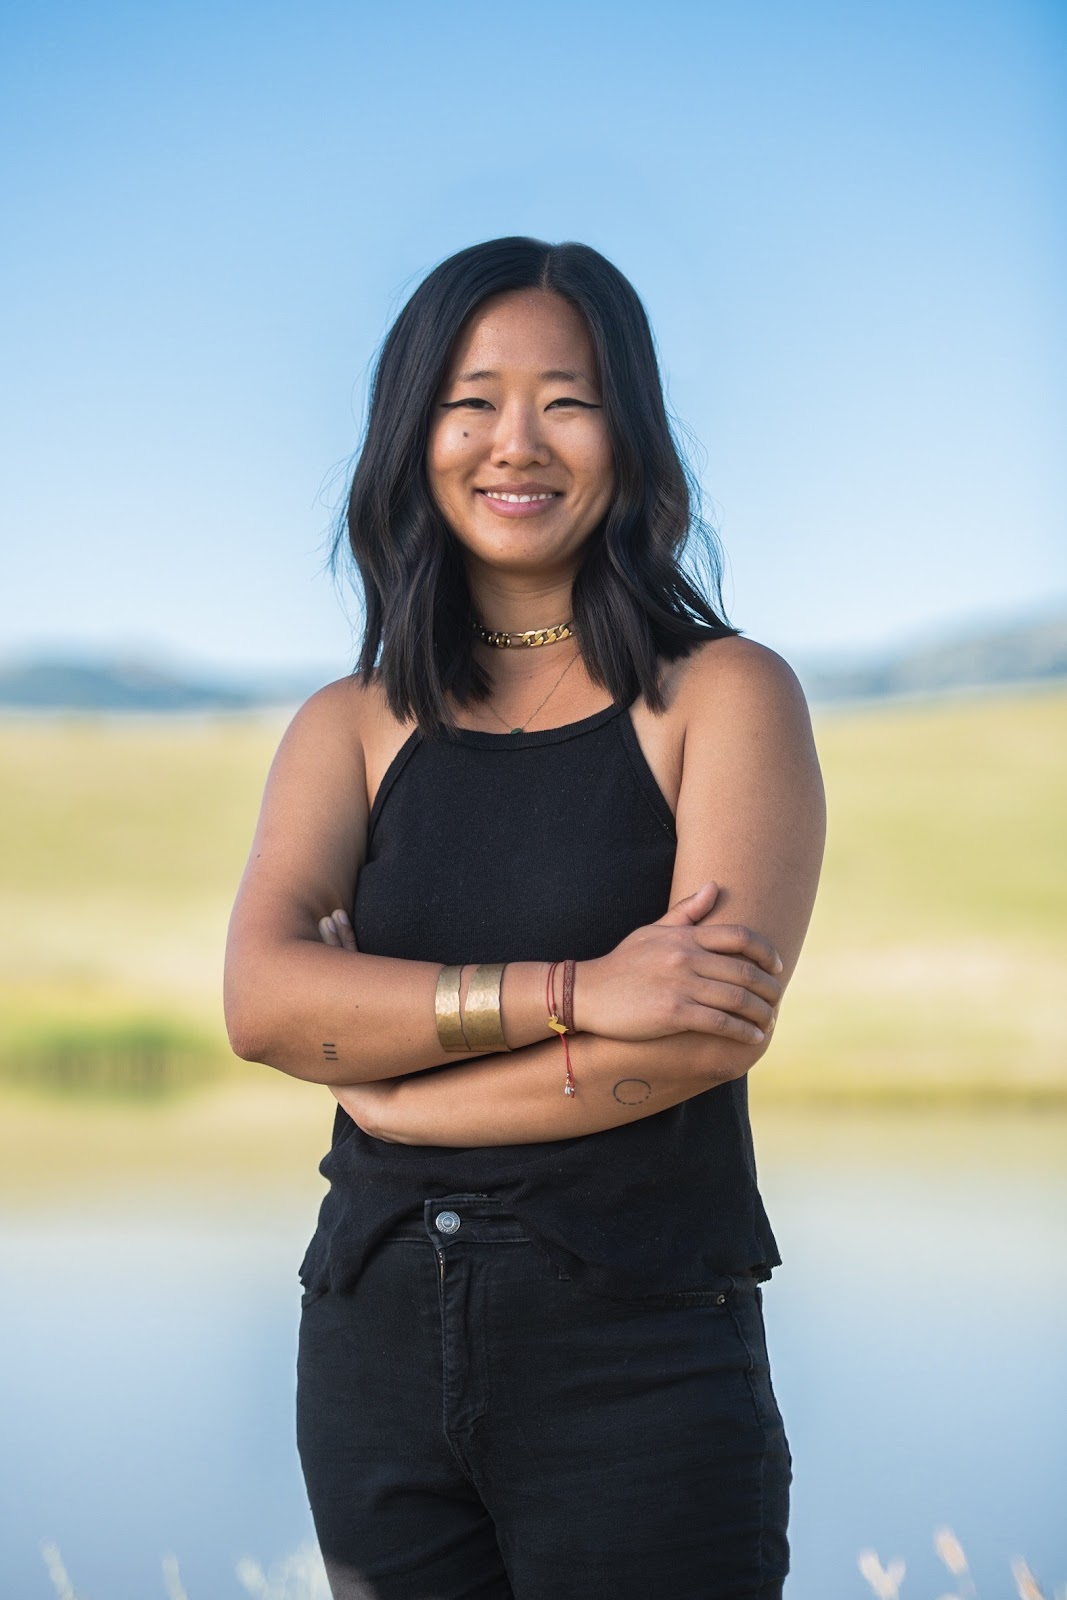 Sophia Sunwoo founder and principal of ascent srtategy headshot